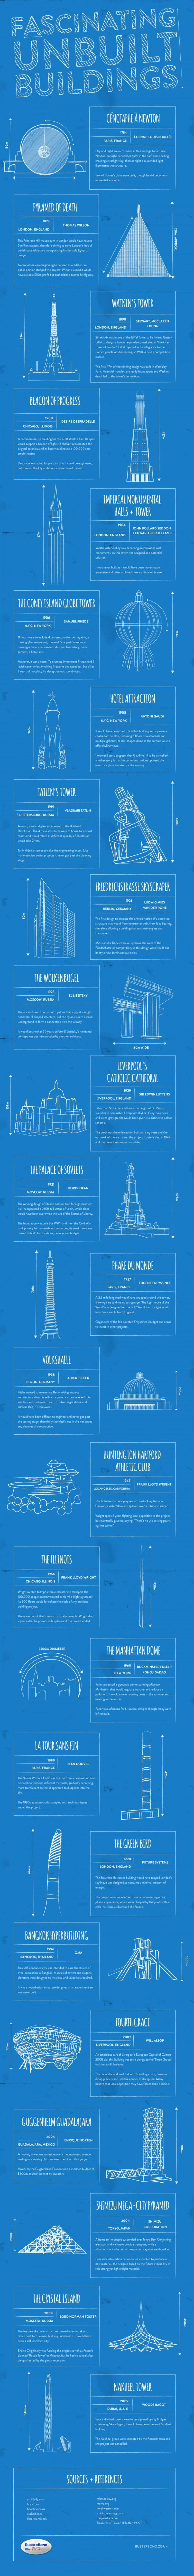 Fascinating Unbuilt Buildings